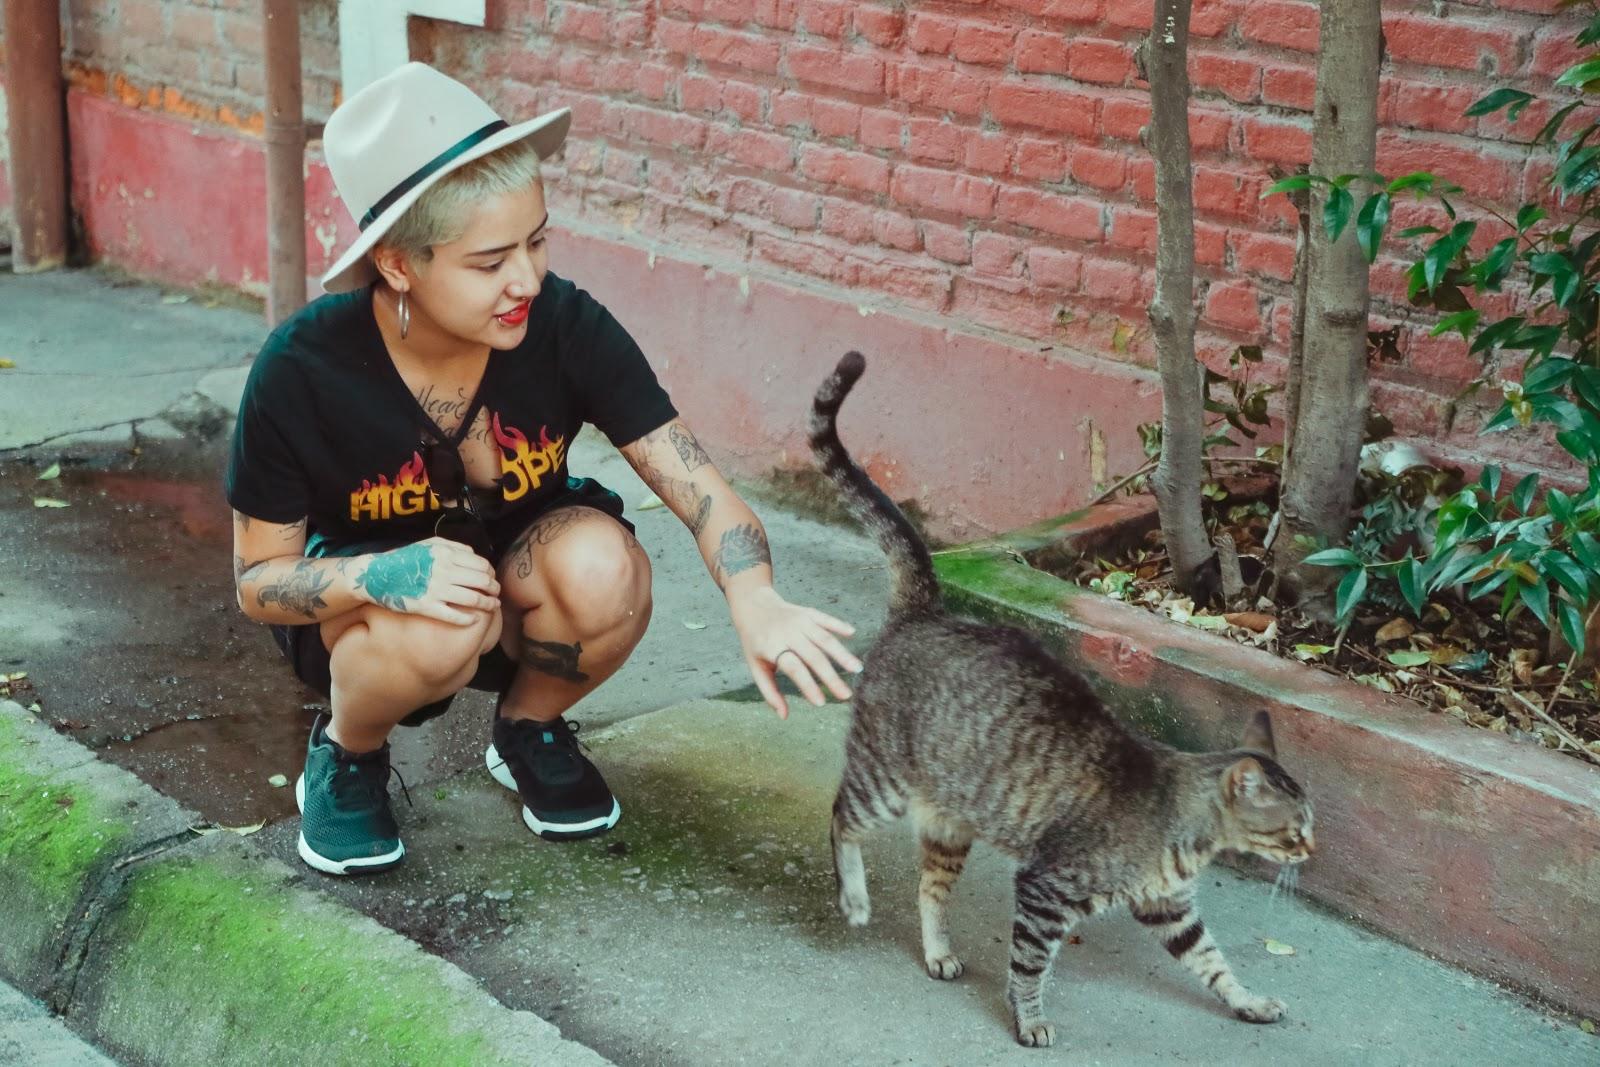 Woman bent down to pet cat that's walking away